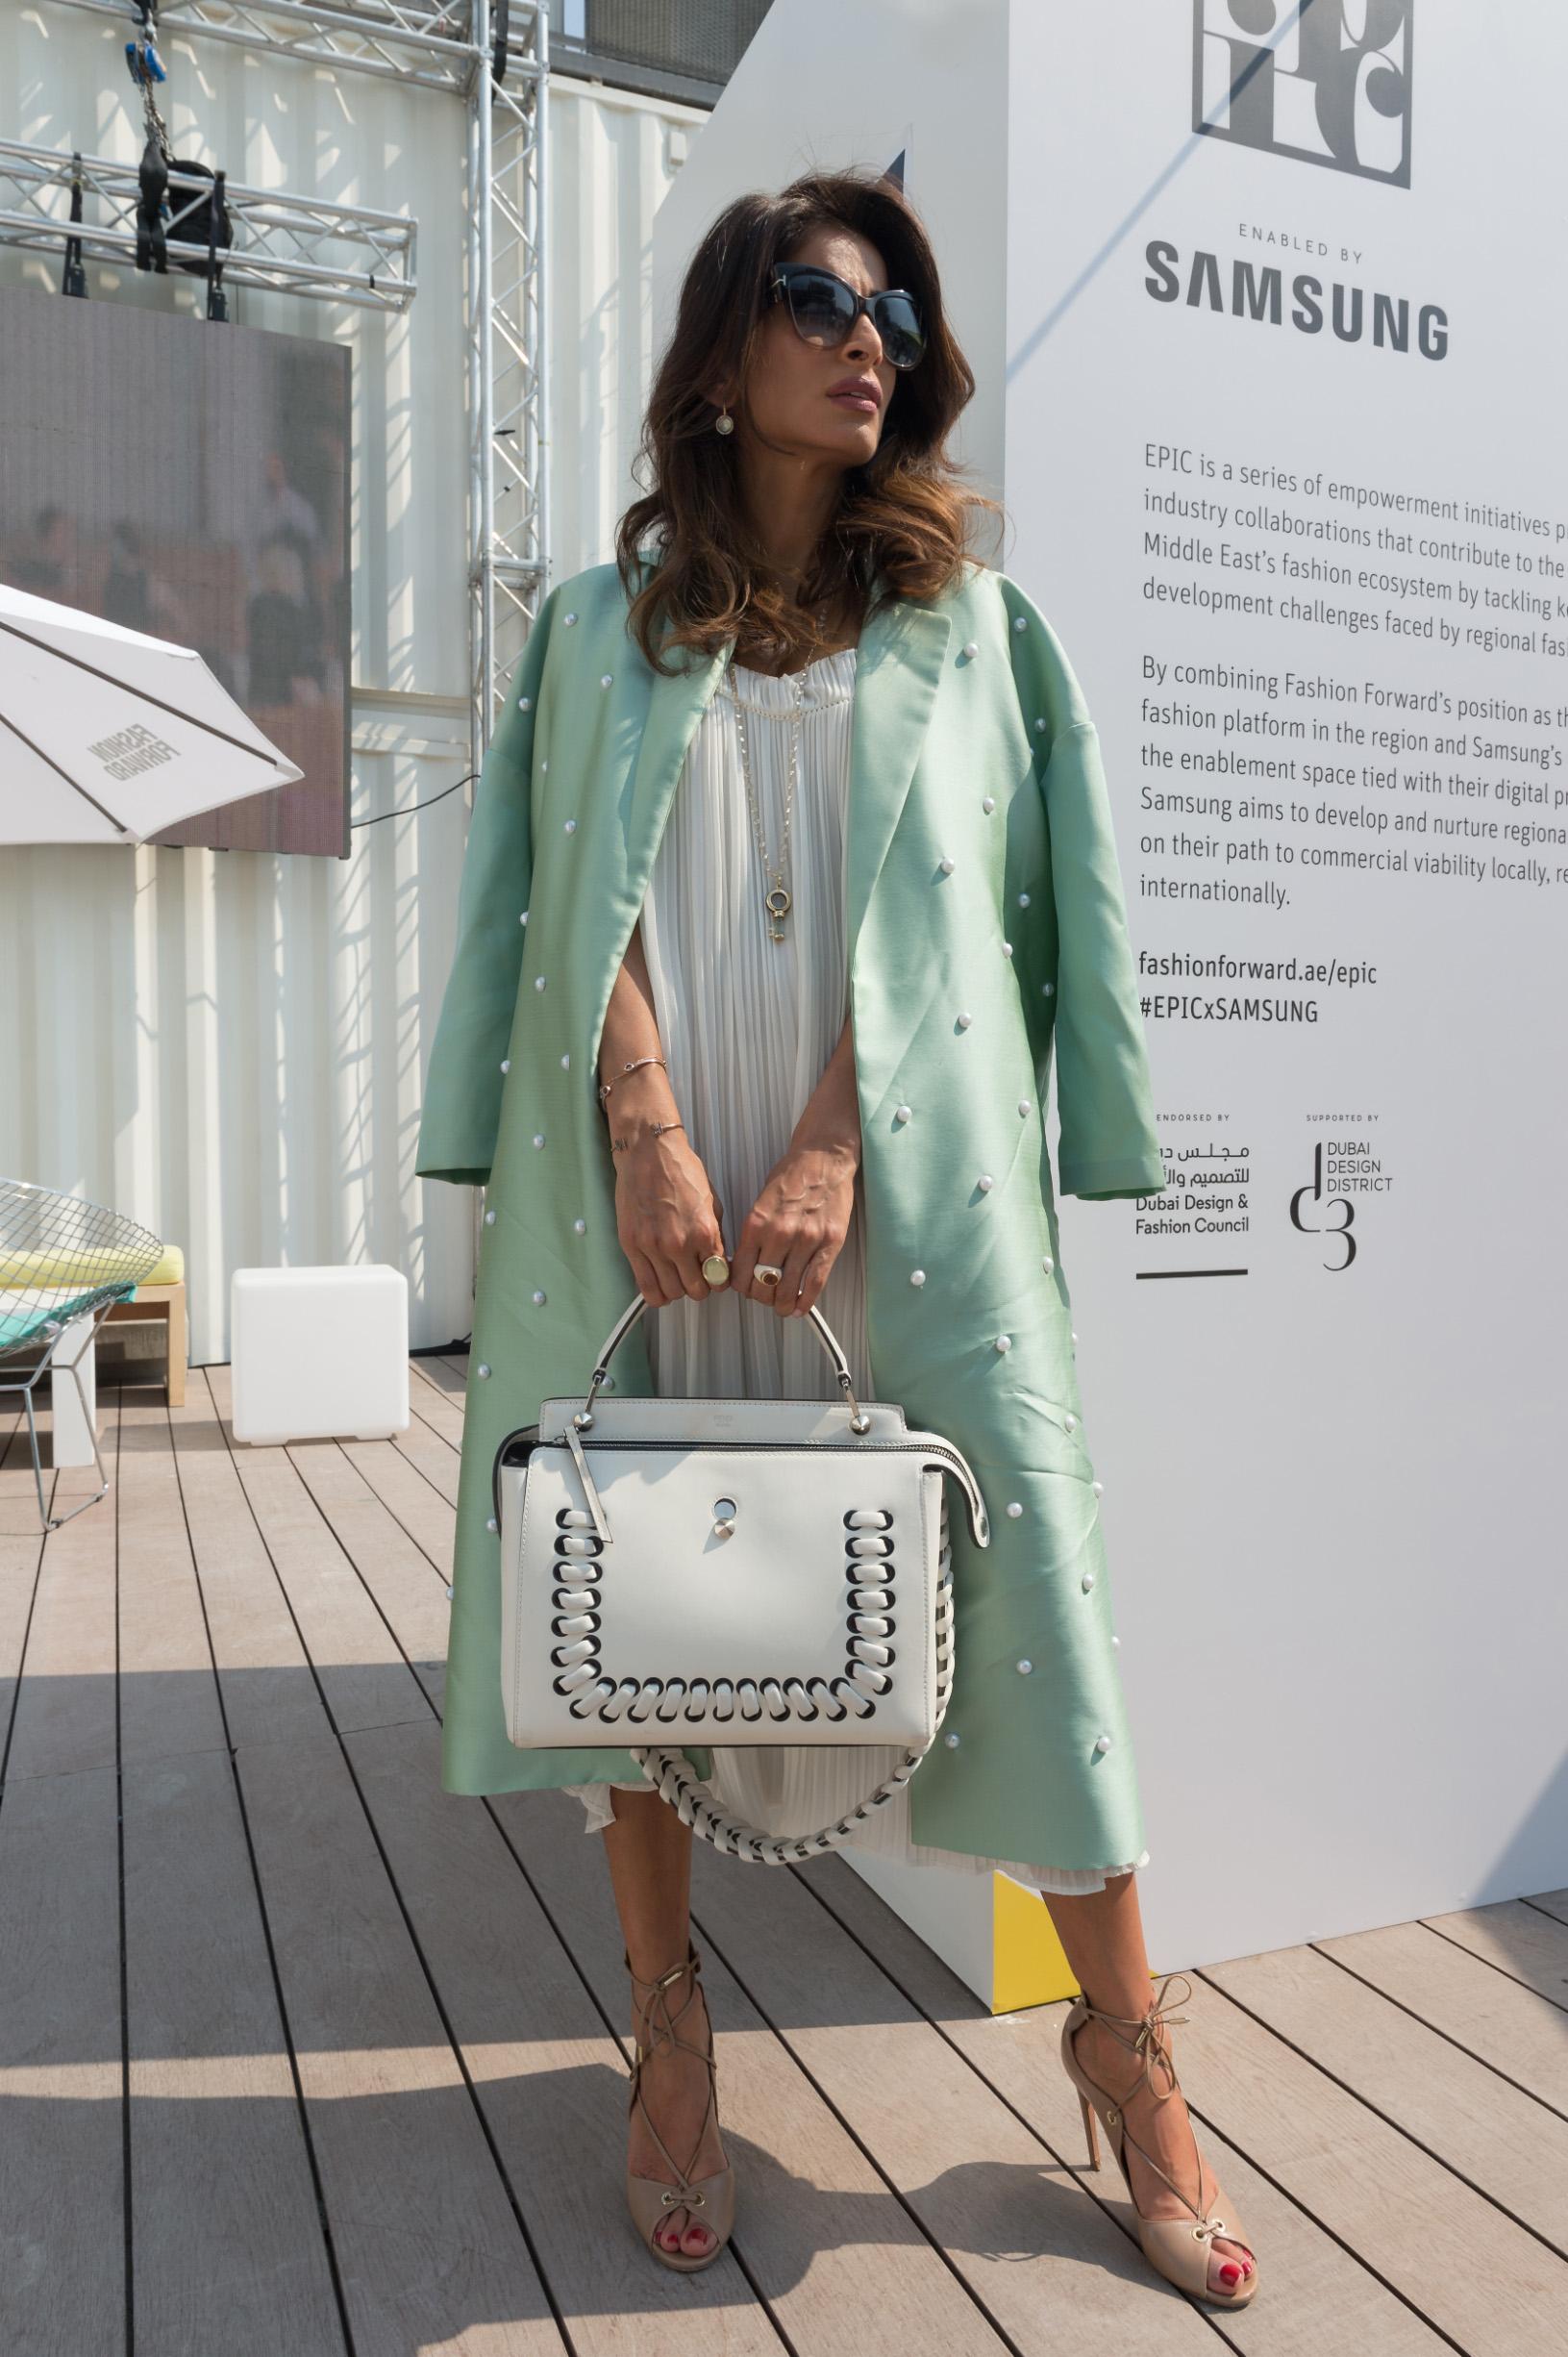 DUBAI, UNITED ARAB EMIRATES - OCTOBER 21:  Managing Director of RR & Co Rosemin Manji attends Fashion Forward Spring/Summer 2017 at the Dubai Design District on October 21, 2016 in Dubai, United Arab Emirates.  (Photo by Cedric Ribeiro/Getty Images)